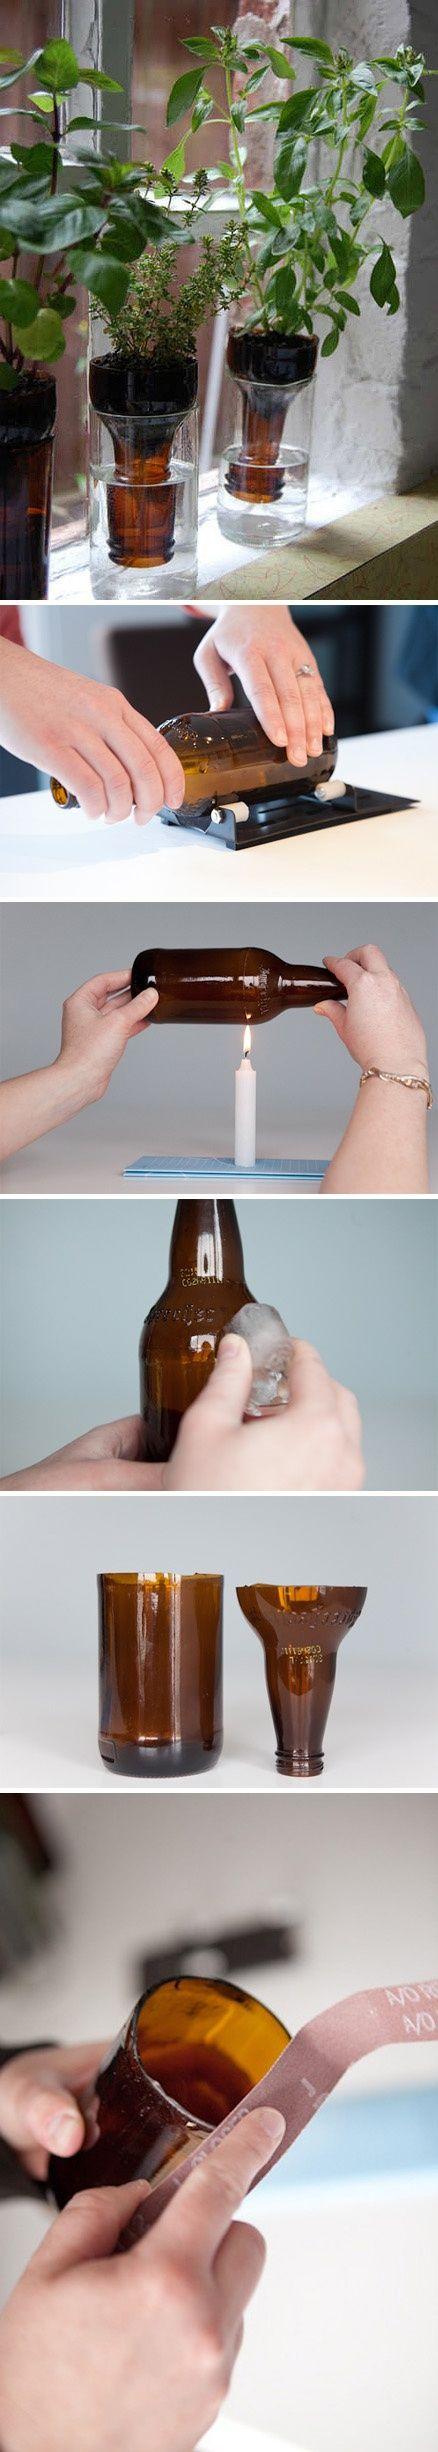 Wedding Ideas: diy-beer-bottle-vase